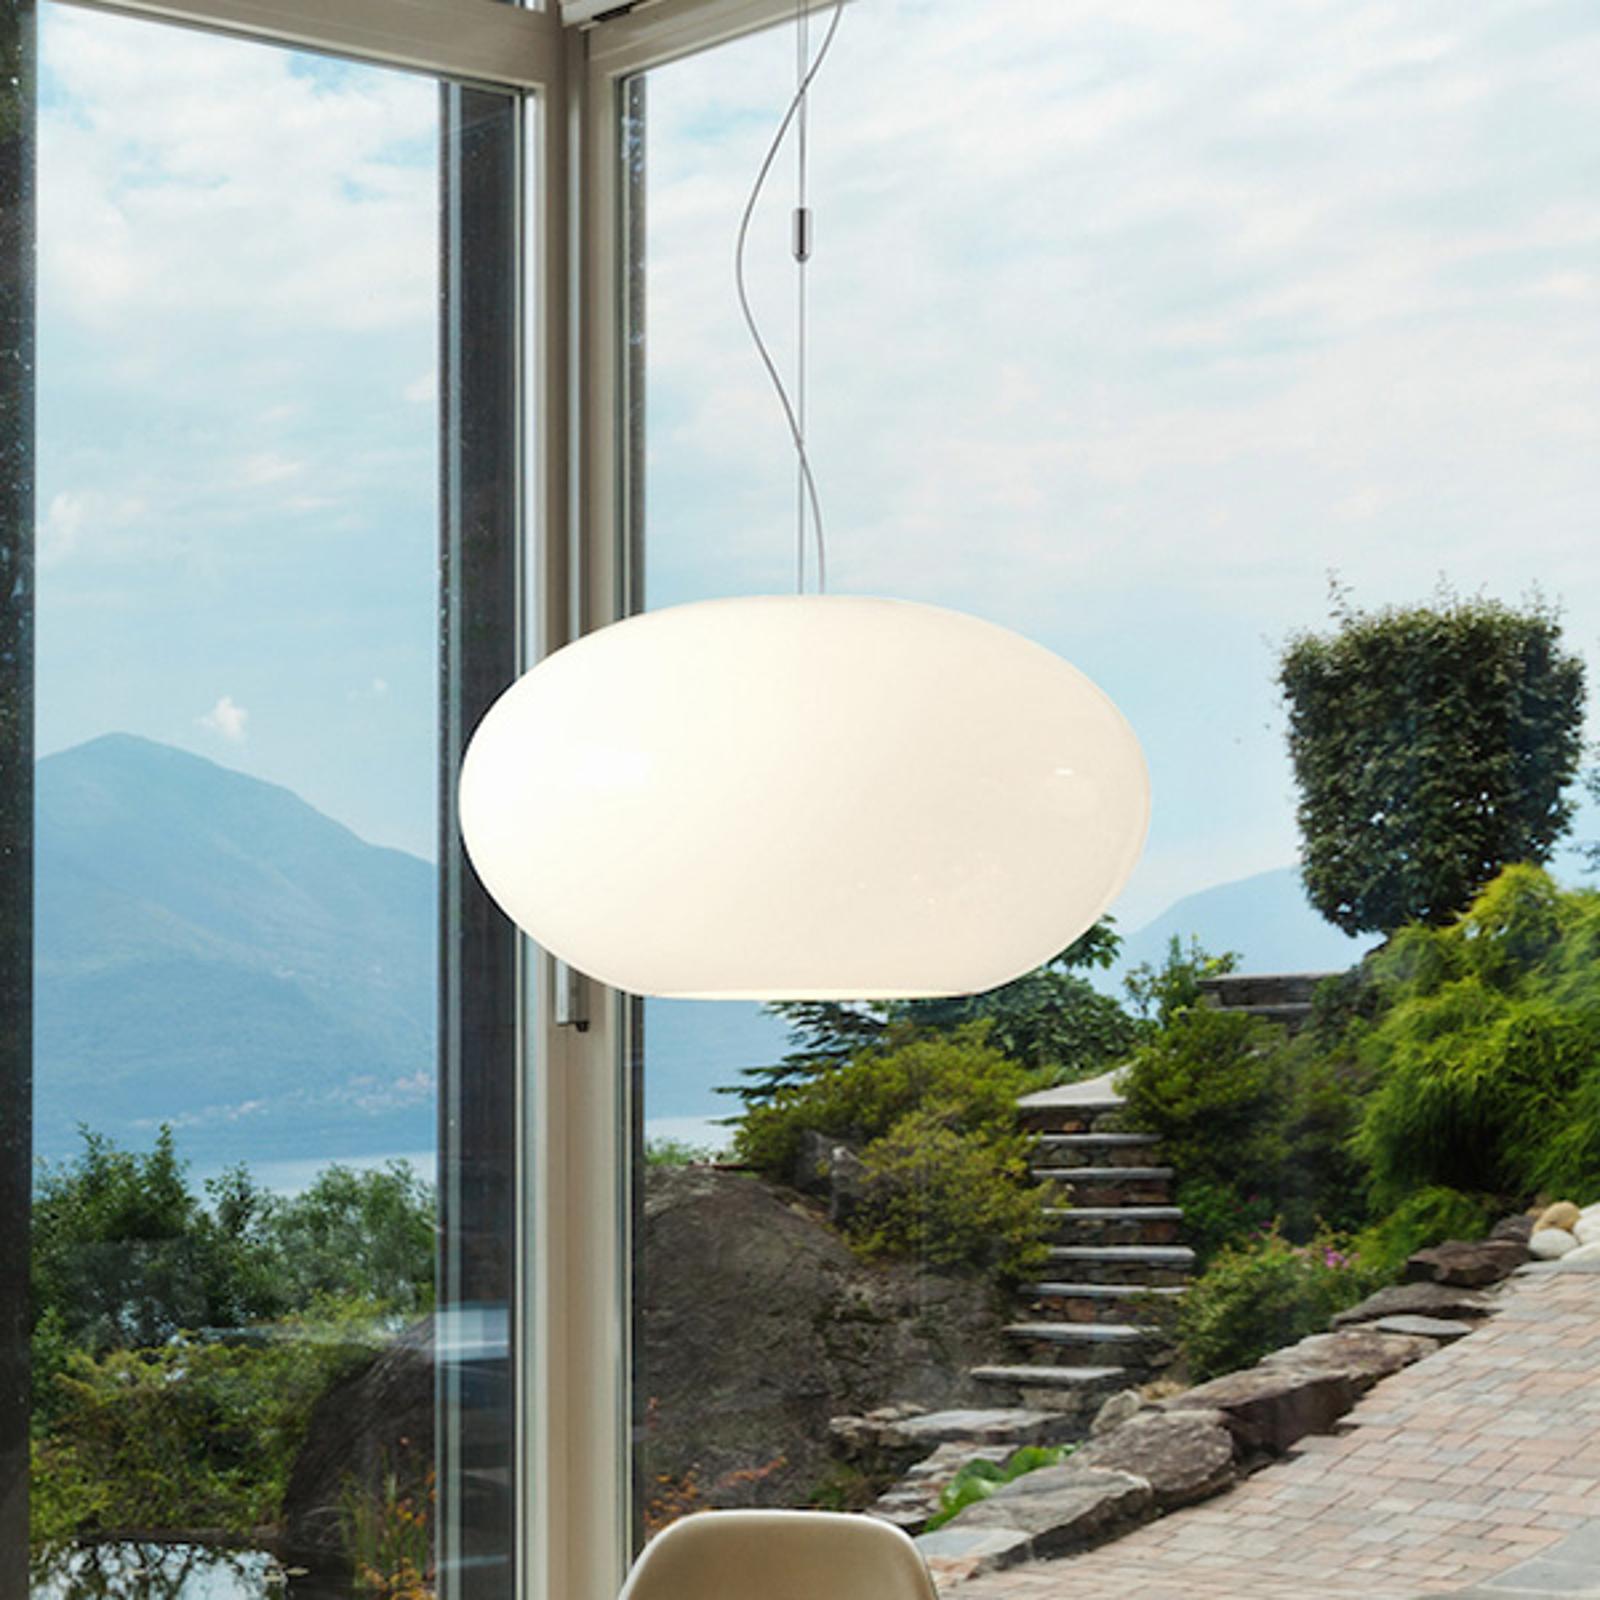 Glazen hanglamp AIH, 38 cm, wit glanzend